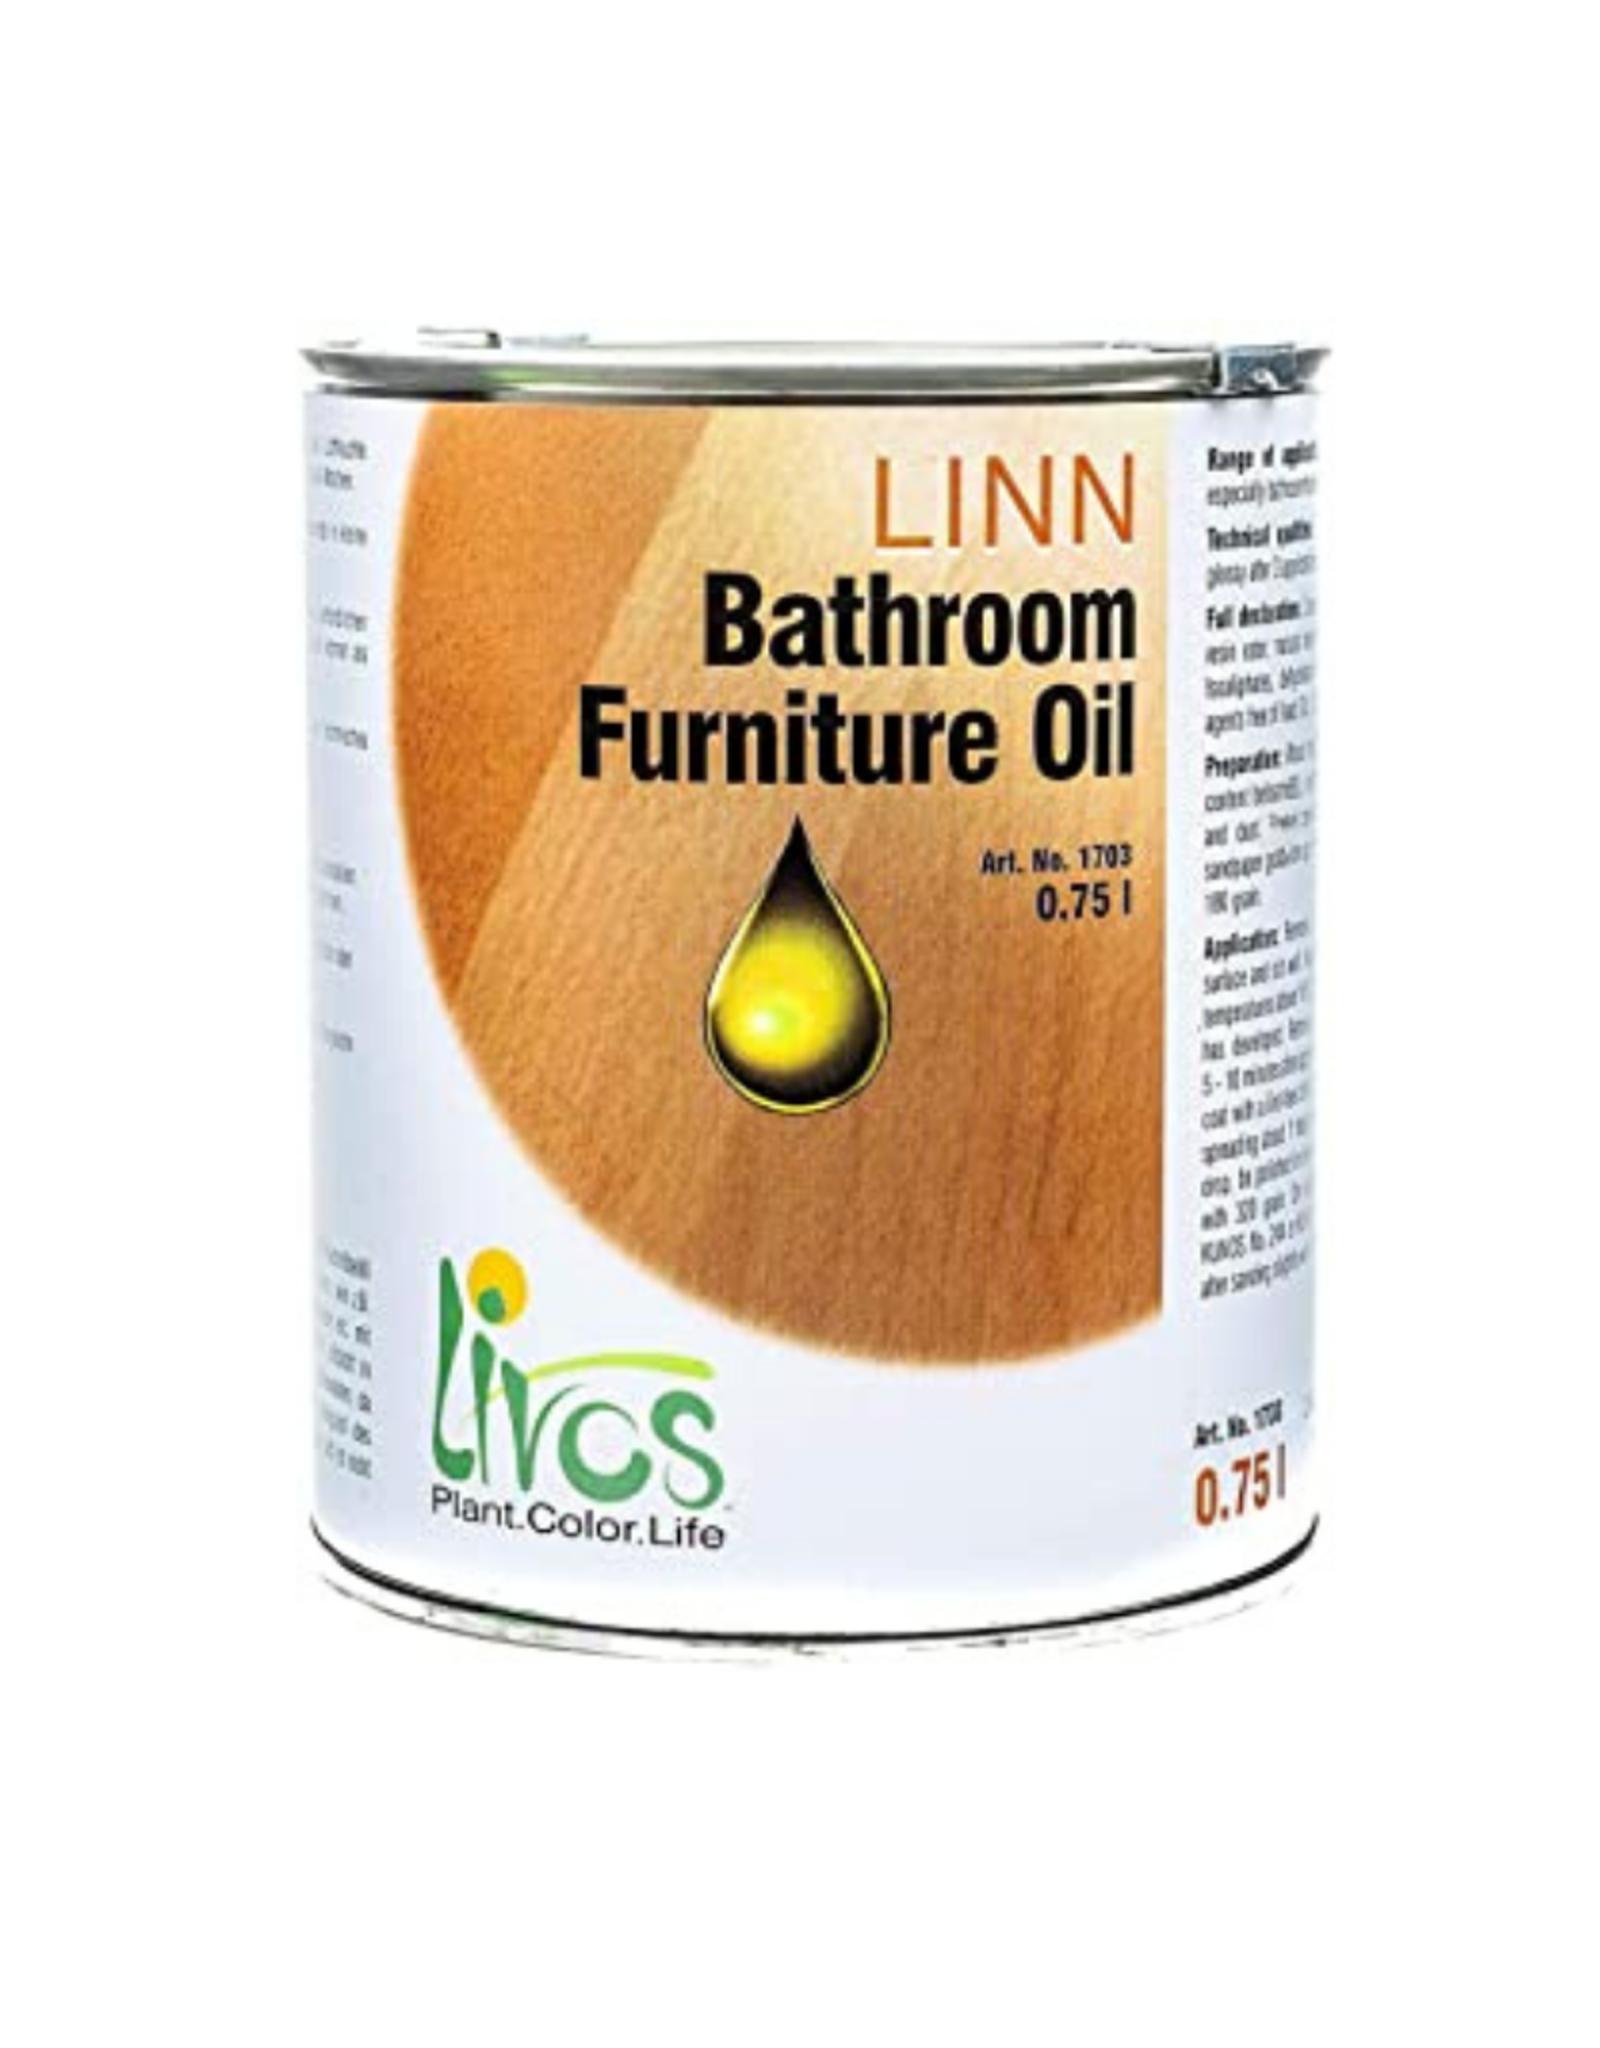 LIVOS Linn Bathroom Furniture Oil